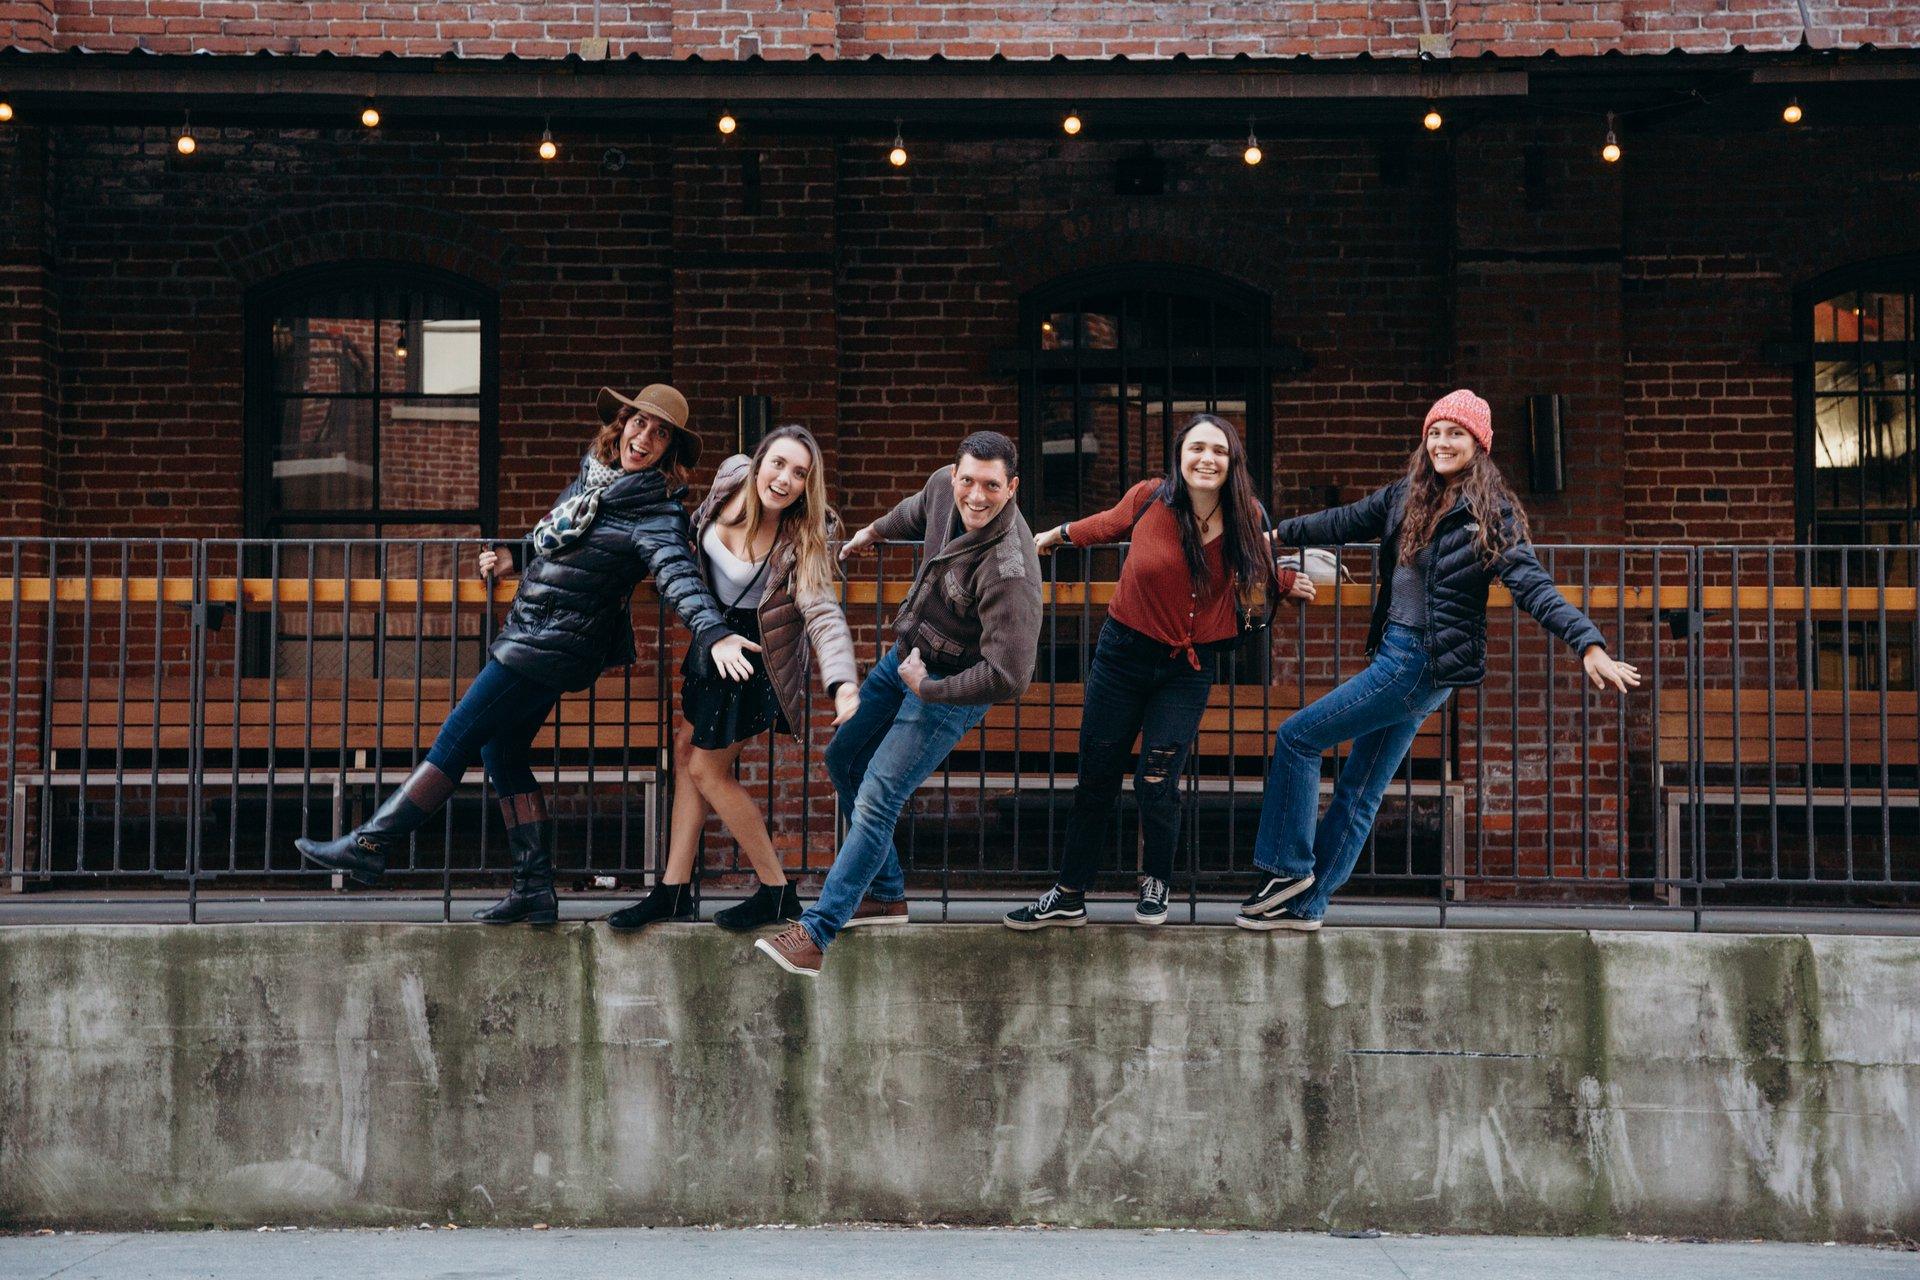 Flytographer Travel Story - Portland Family Reunion